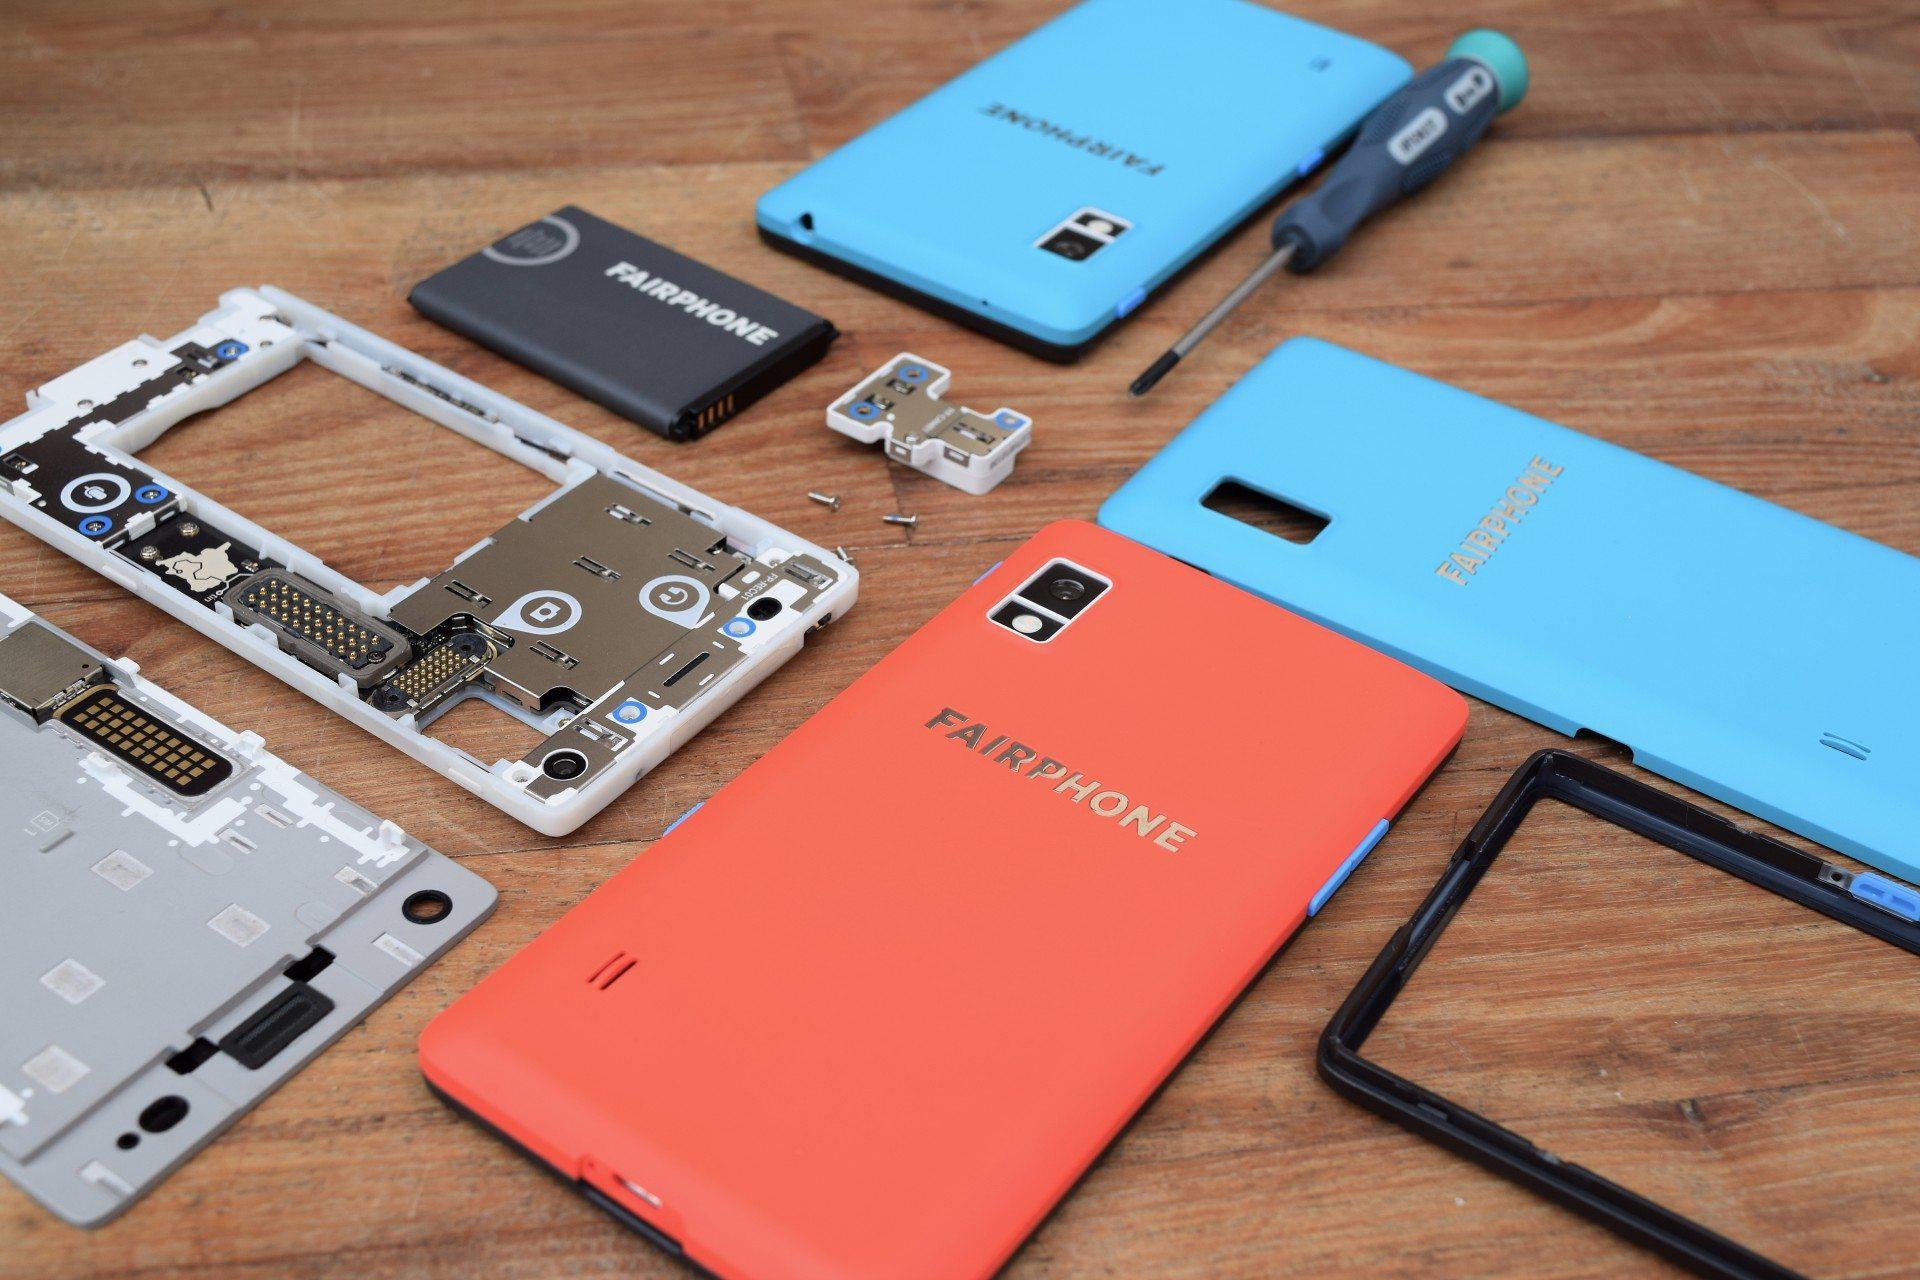 Fairphone onderdelen